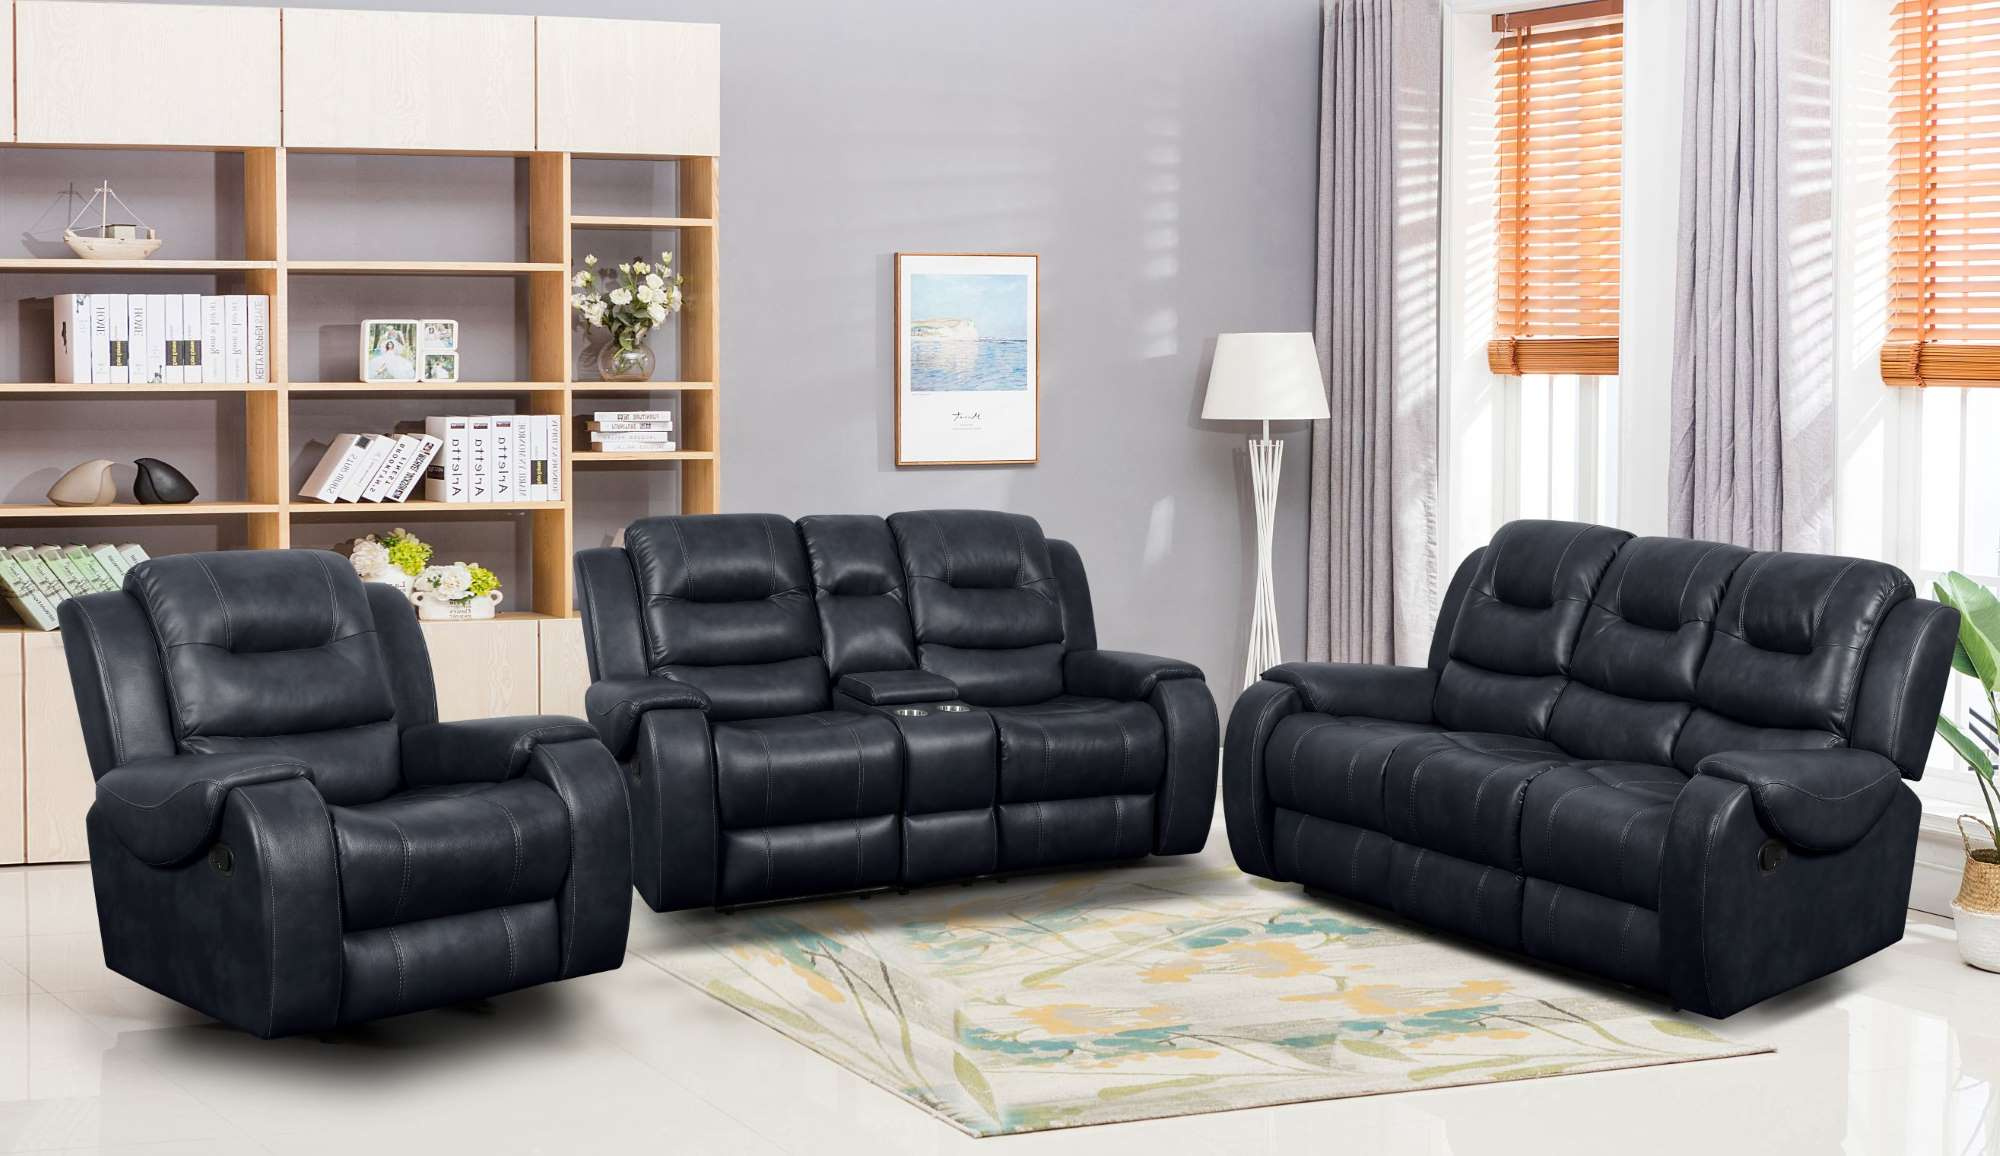 Reclining Sofa and Loveseat Set LRPX2908NA Jasper Navy